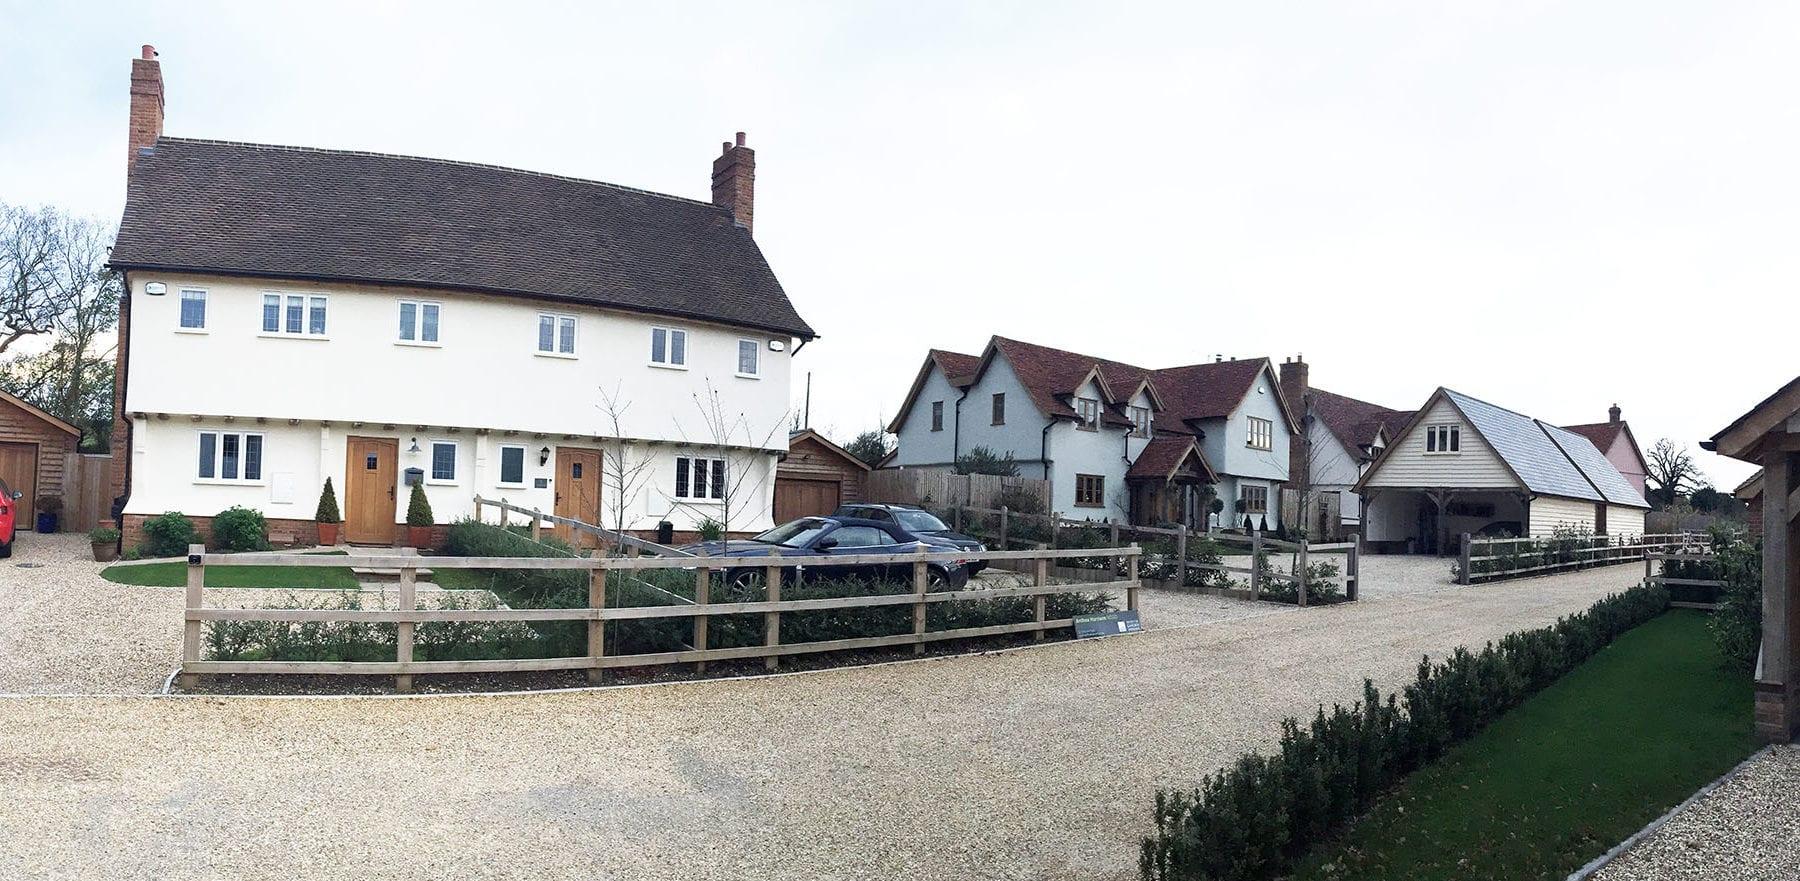 Lifestiles - Handmade Restoration Clay Roof Tiles - Manuden, England 2